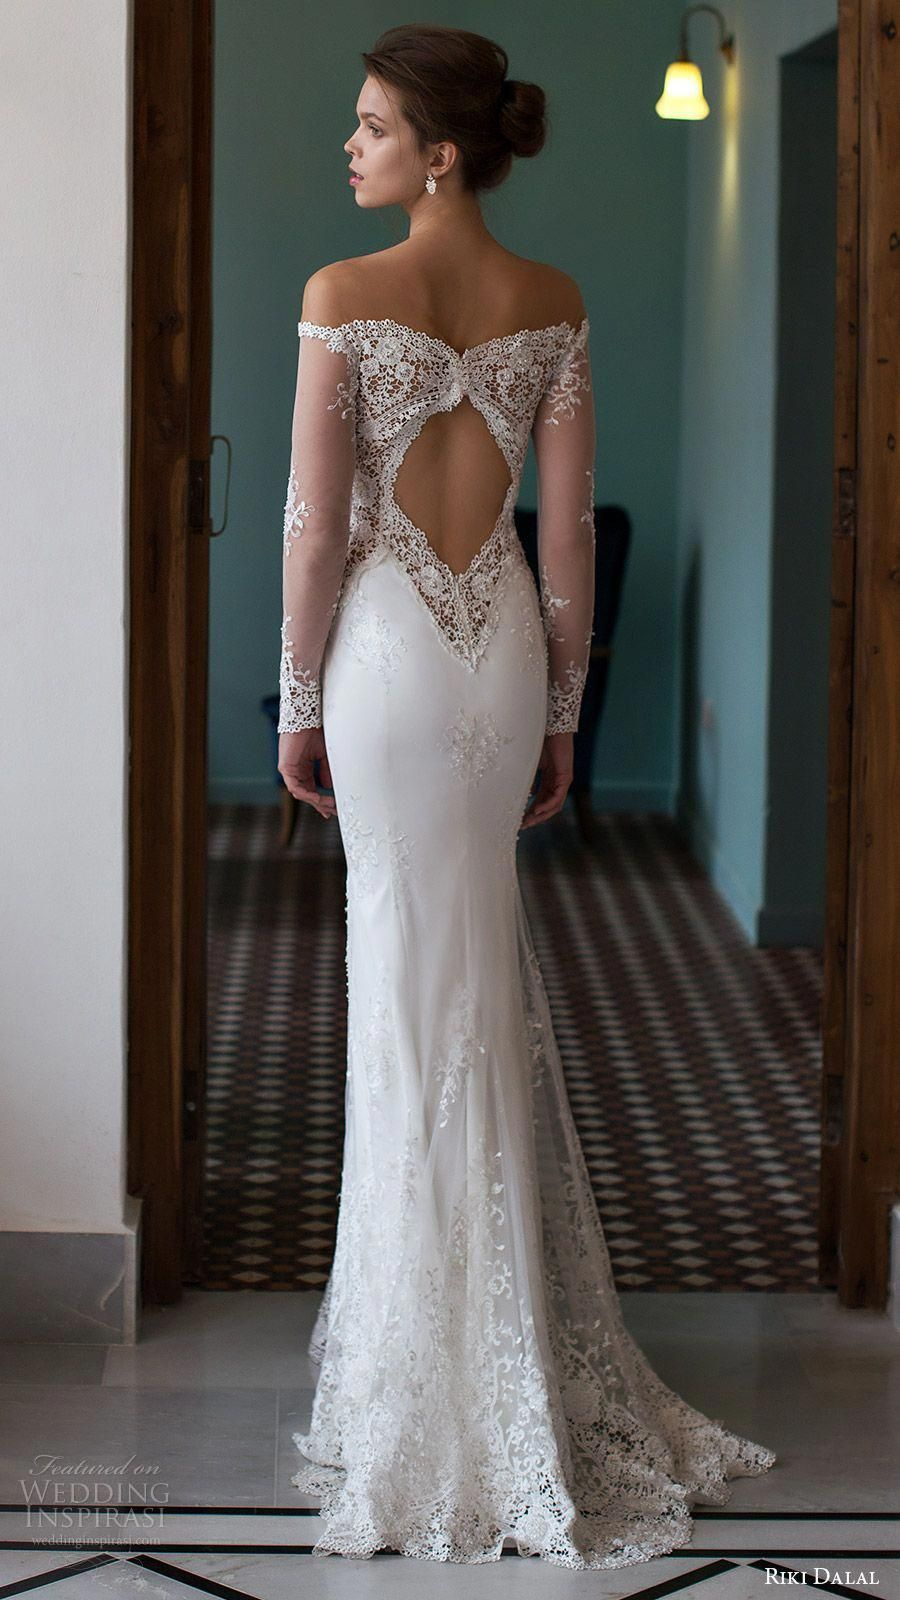 Affordable bridesmaid dresses buy bridal dresses online